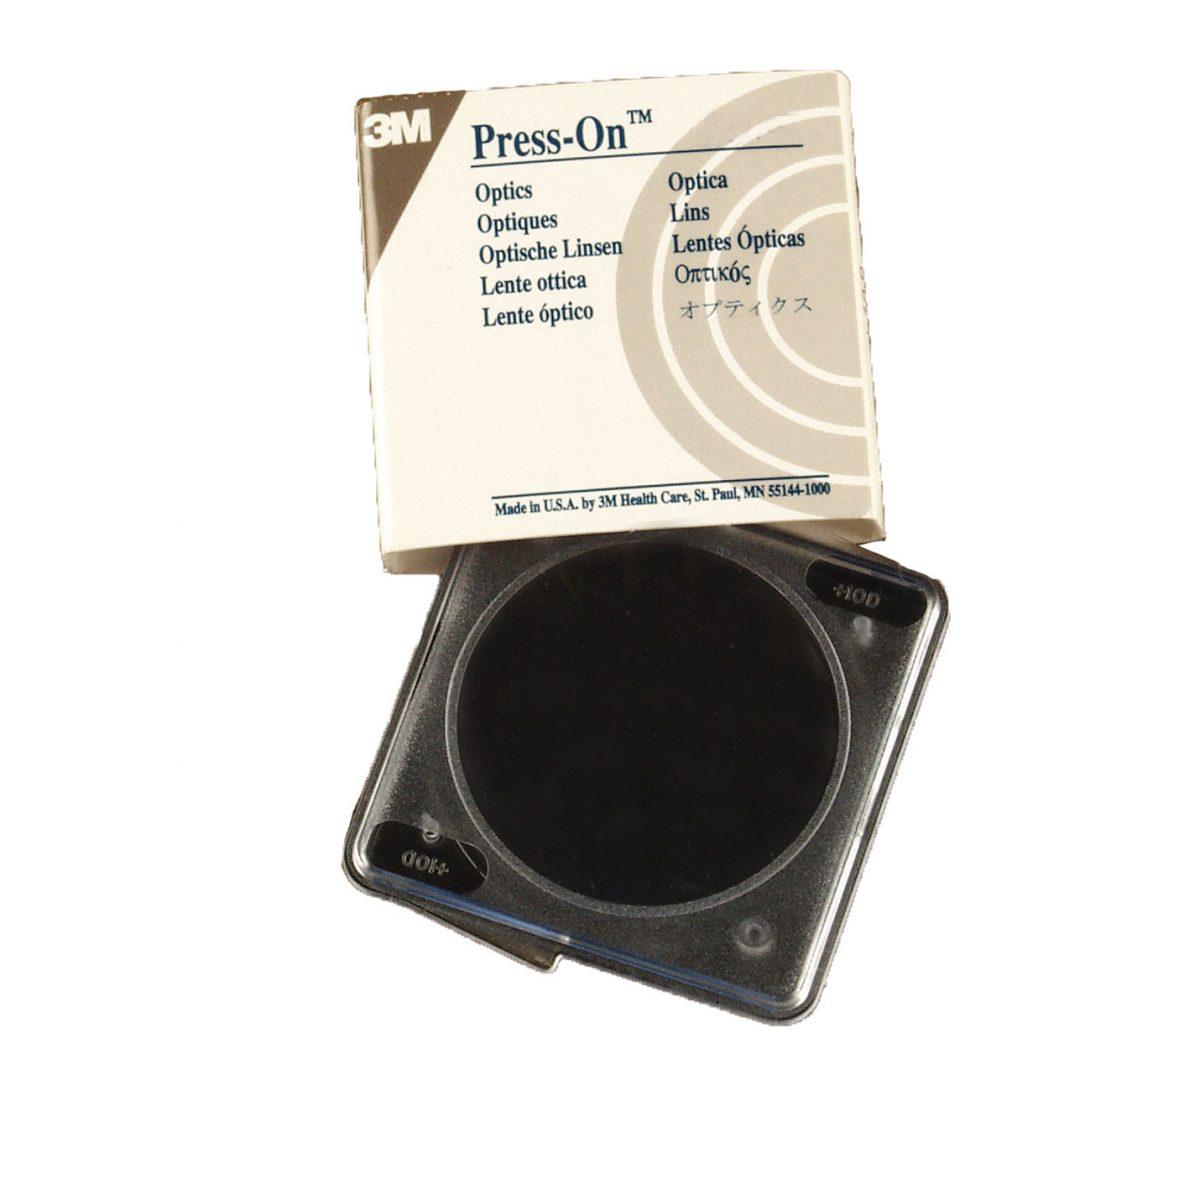 3M™ PRESS-ON™ prism lens